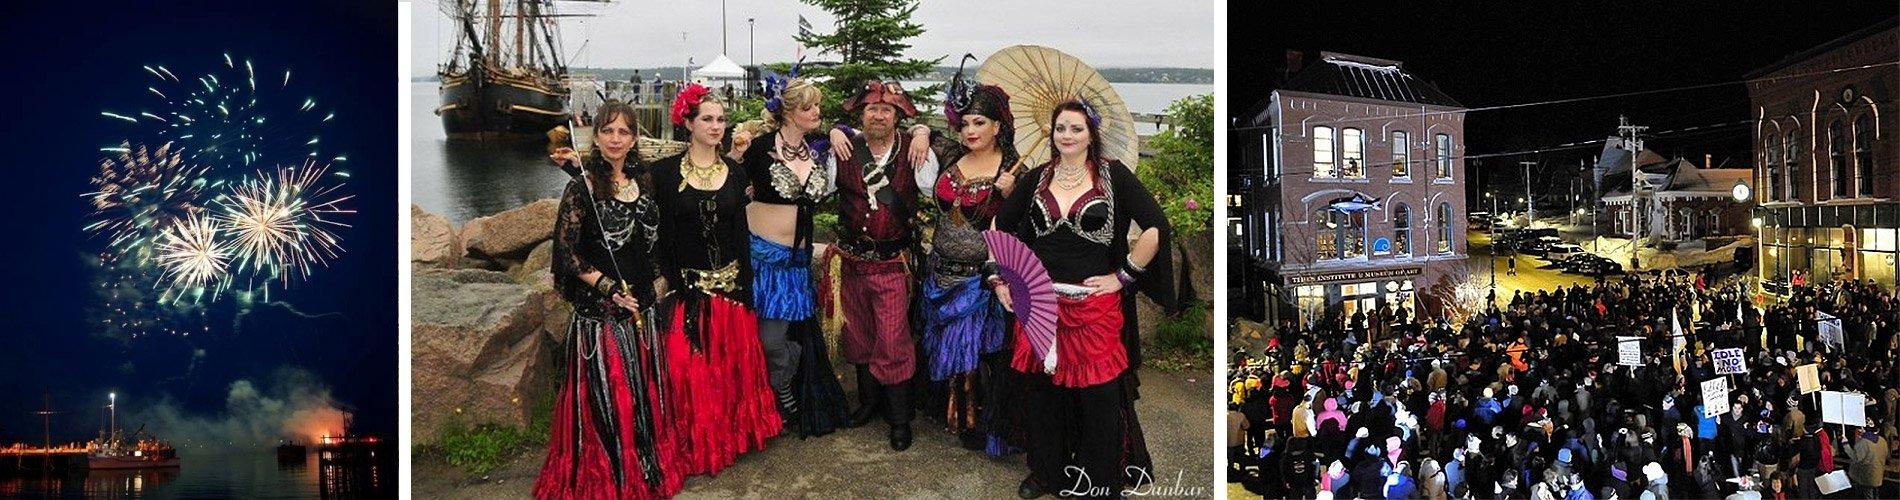 Pirate-Festival-Eastpor